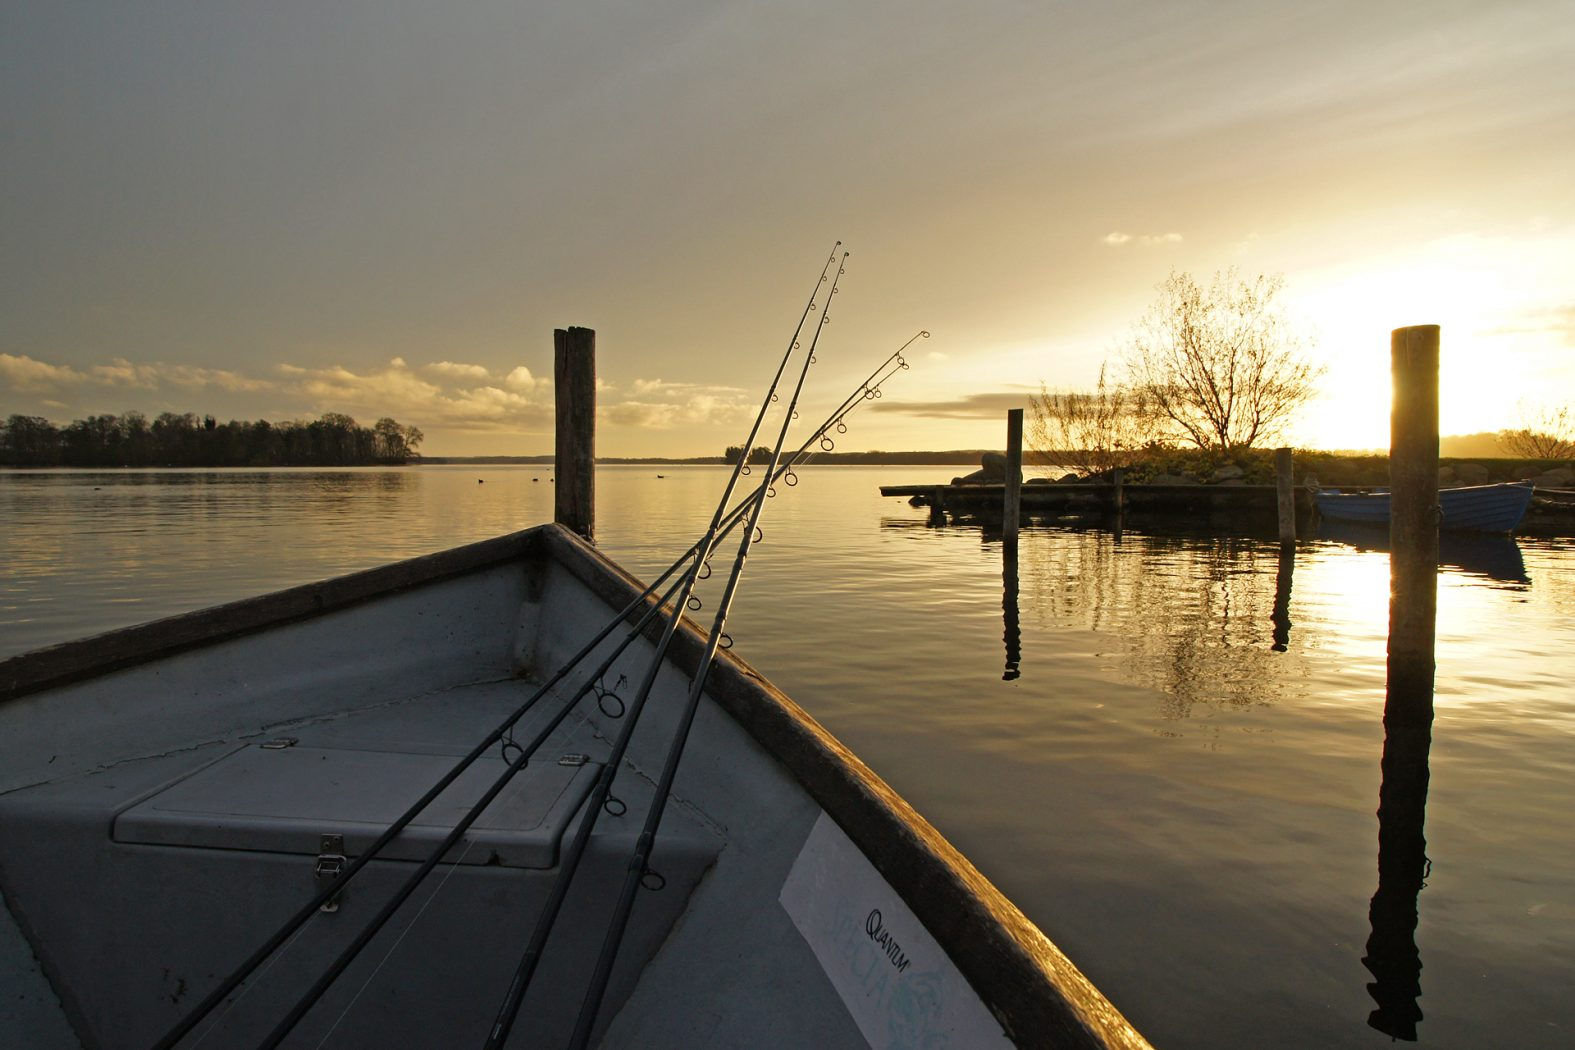 Quappenangeln im Plöner See